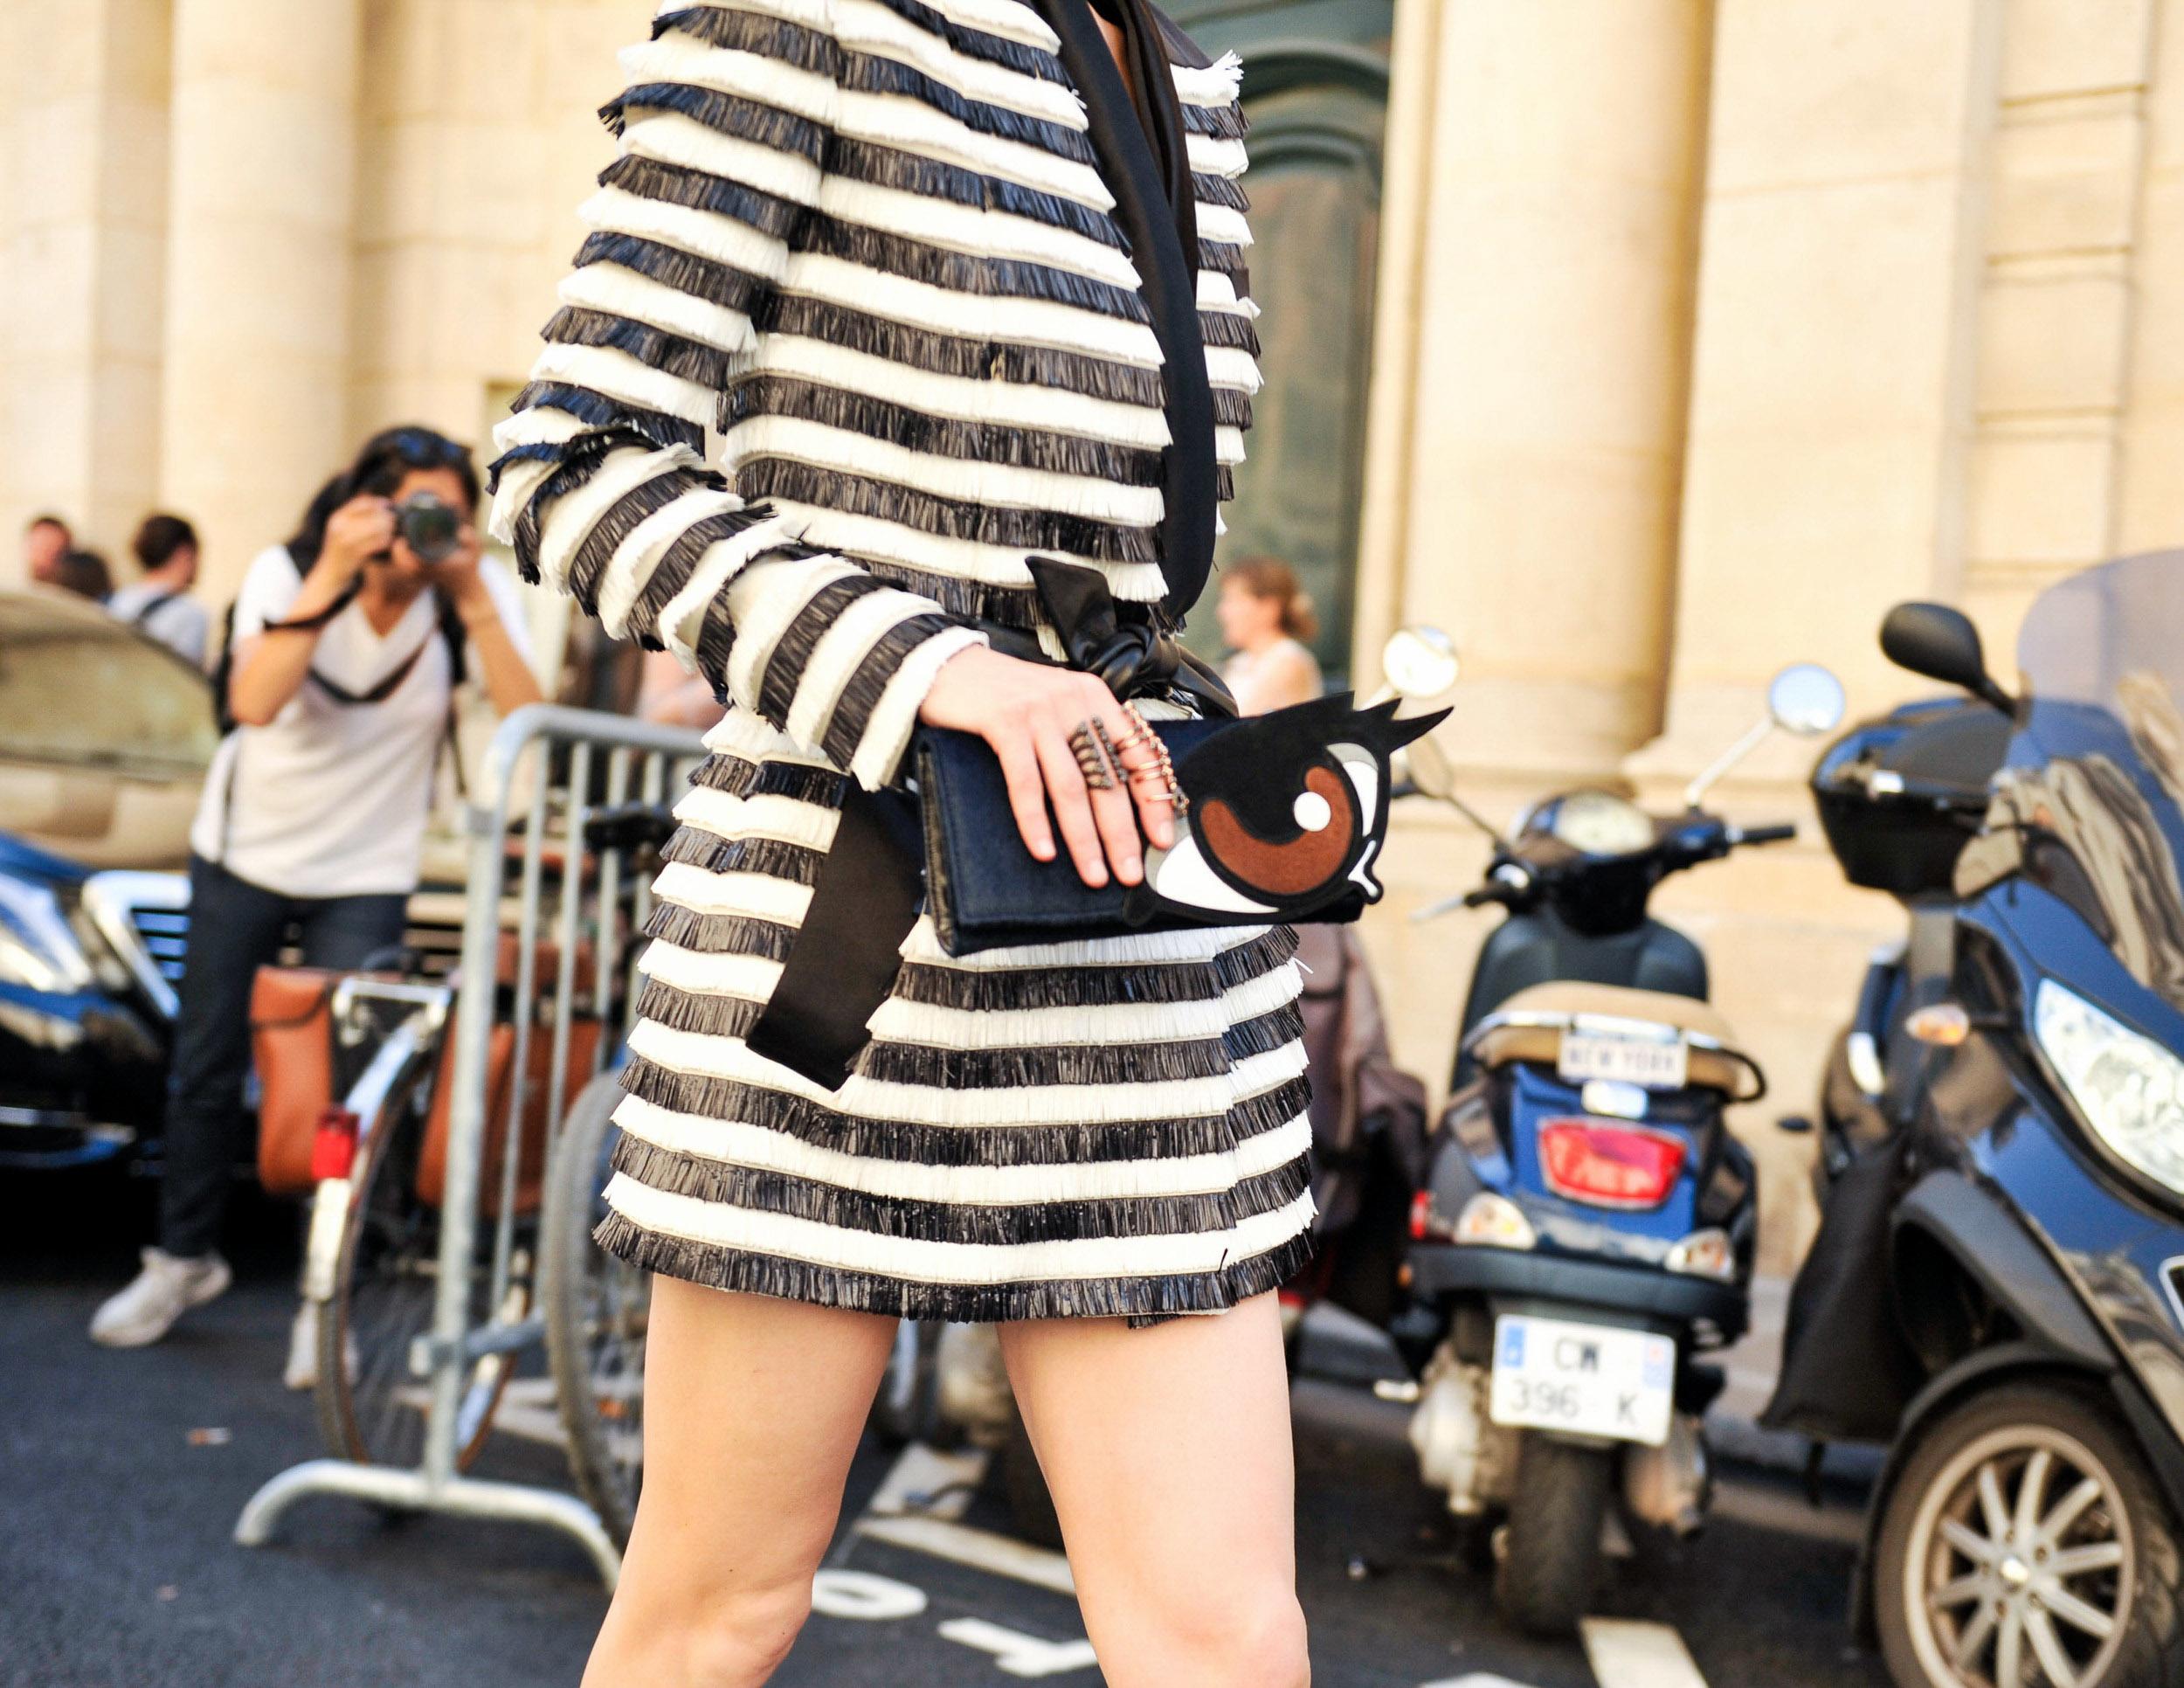 StreetStyle_ParisFashionWeek_LeandroJusten_120.jpg